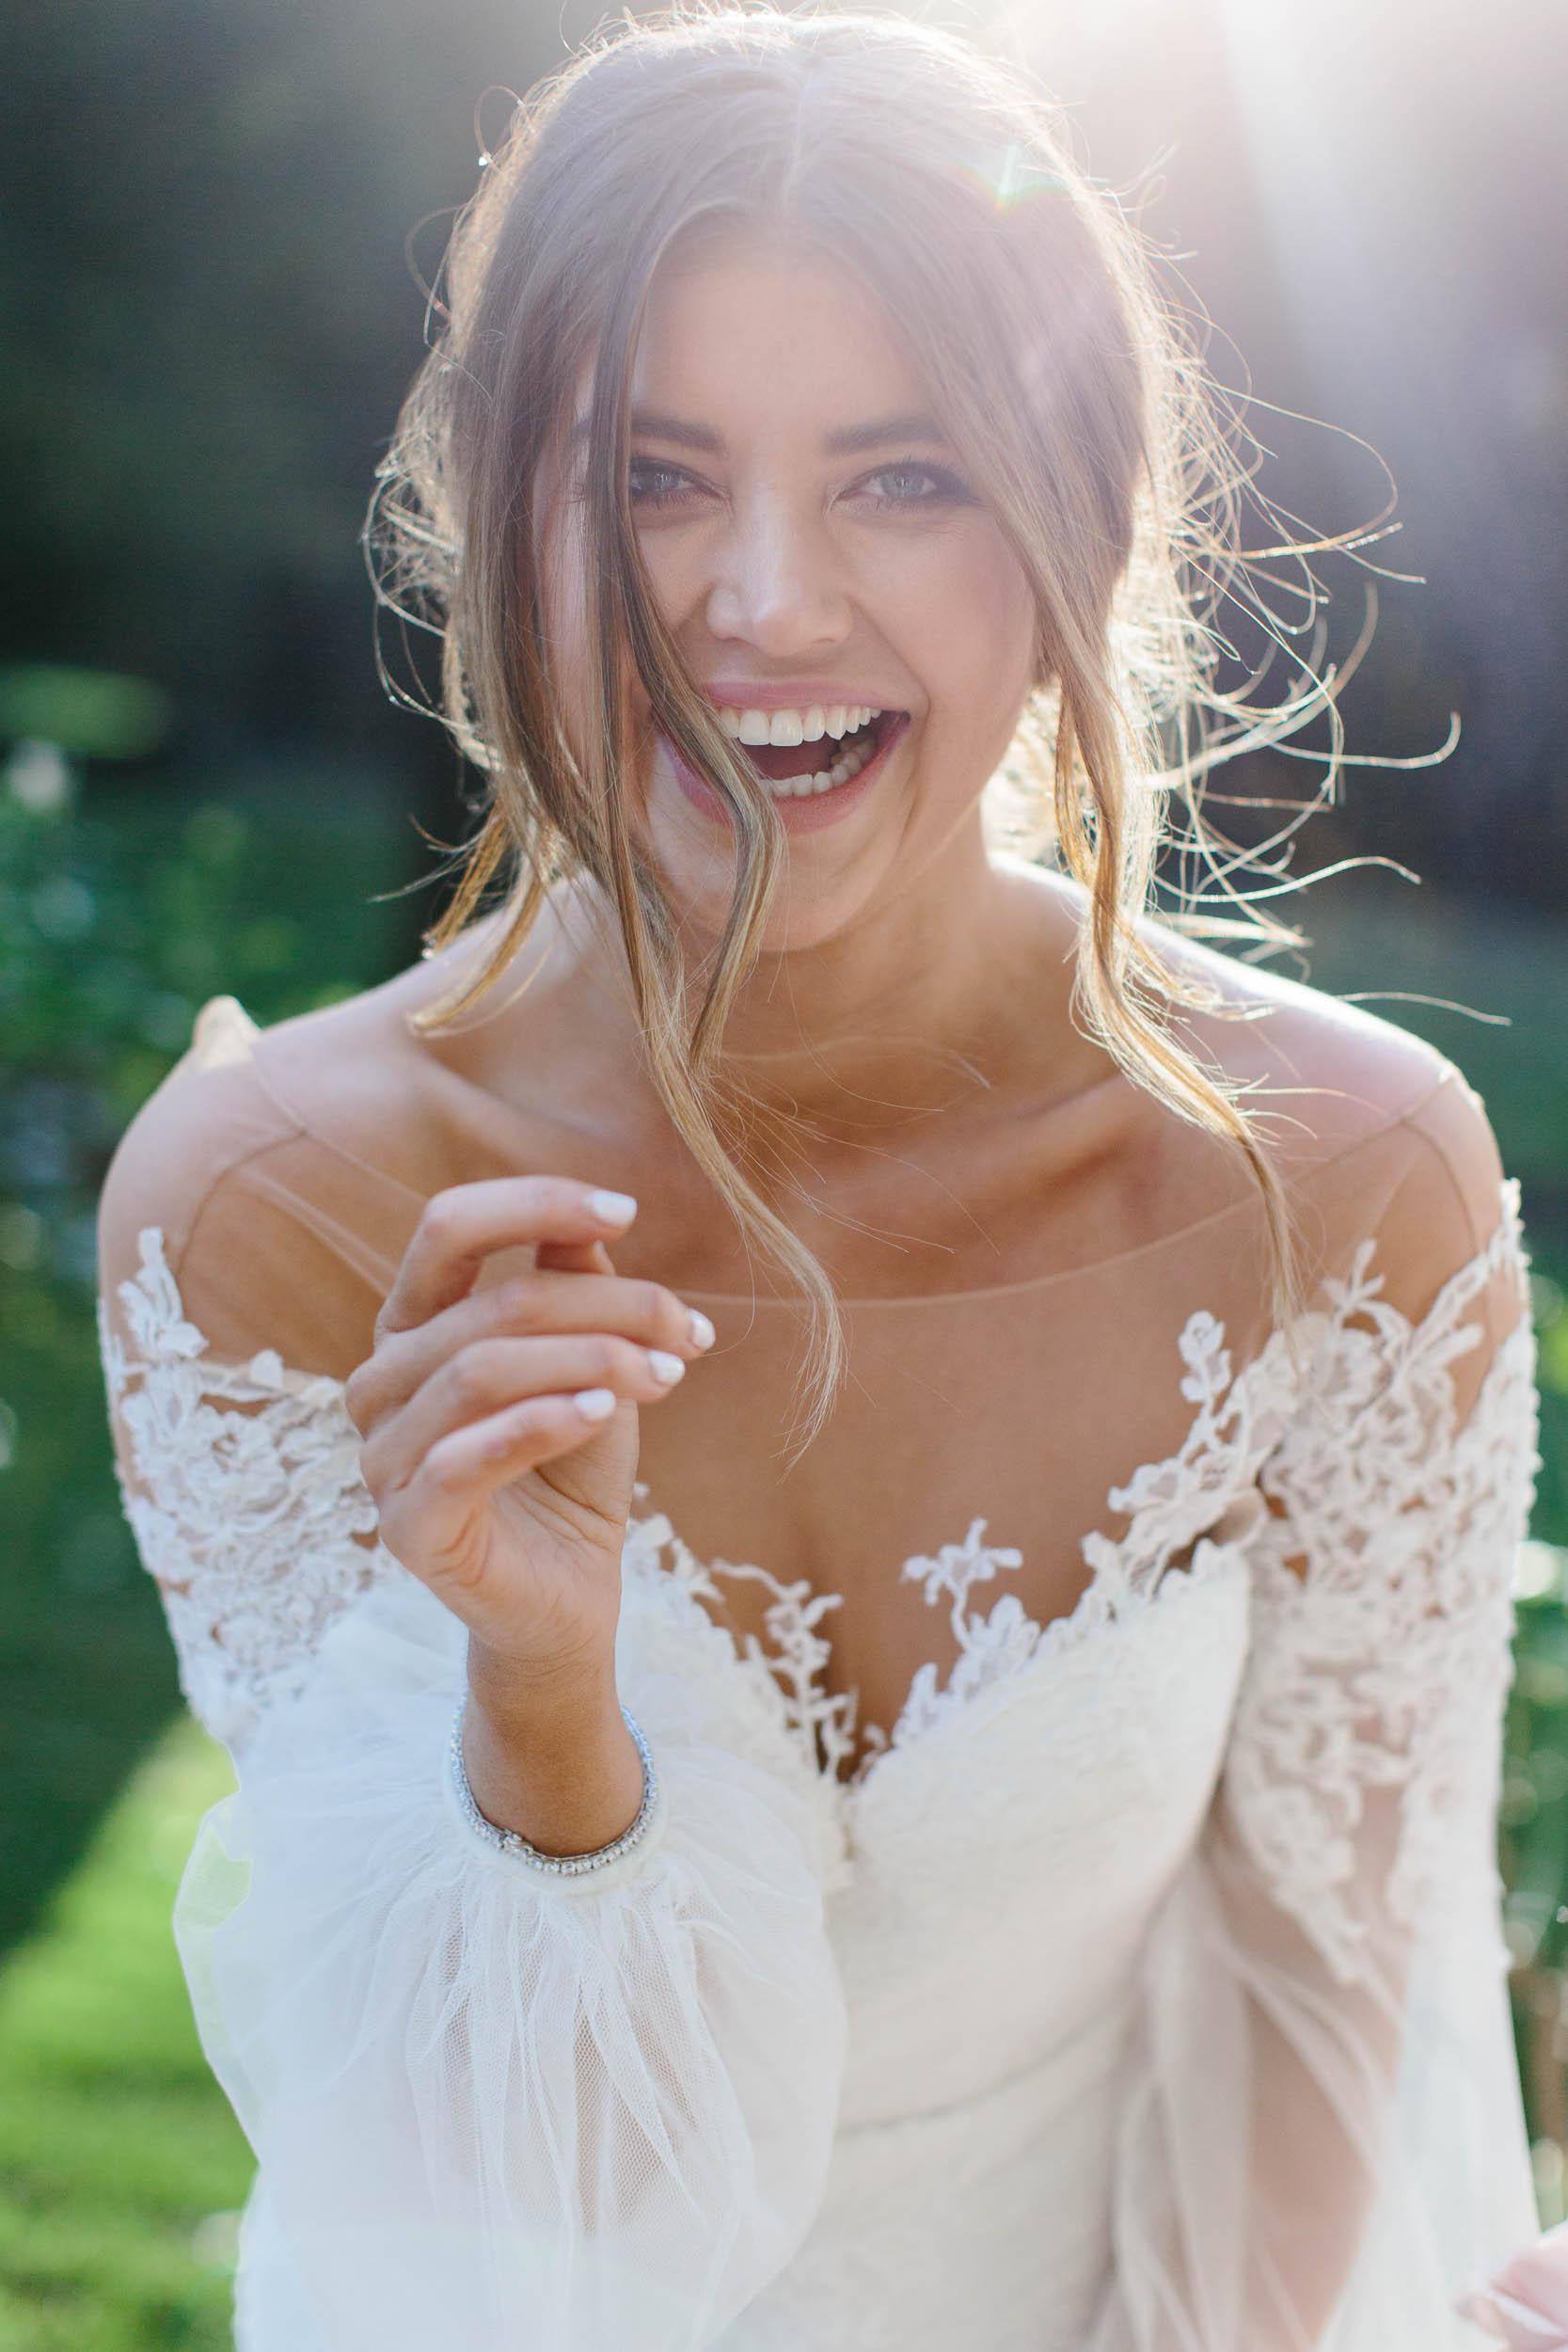 Kas-Richards-LENZO-Yarra-Valley-Wedding-One-Day-Bridal-294.jpg